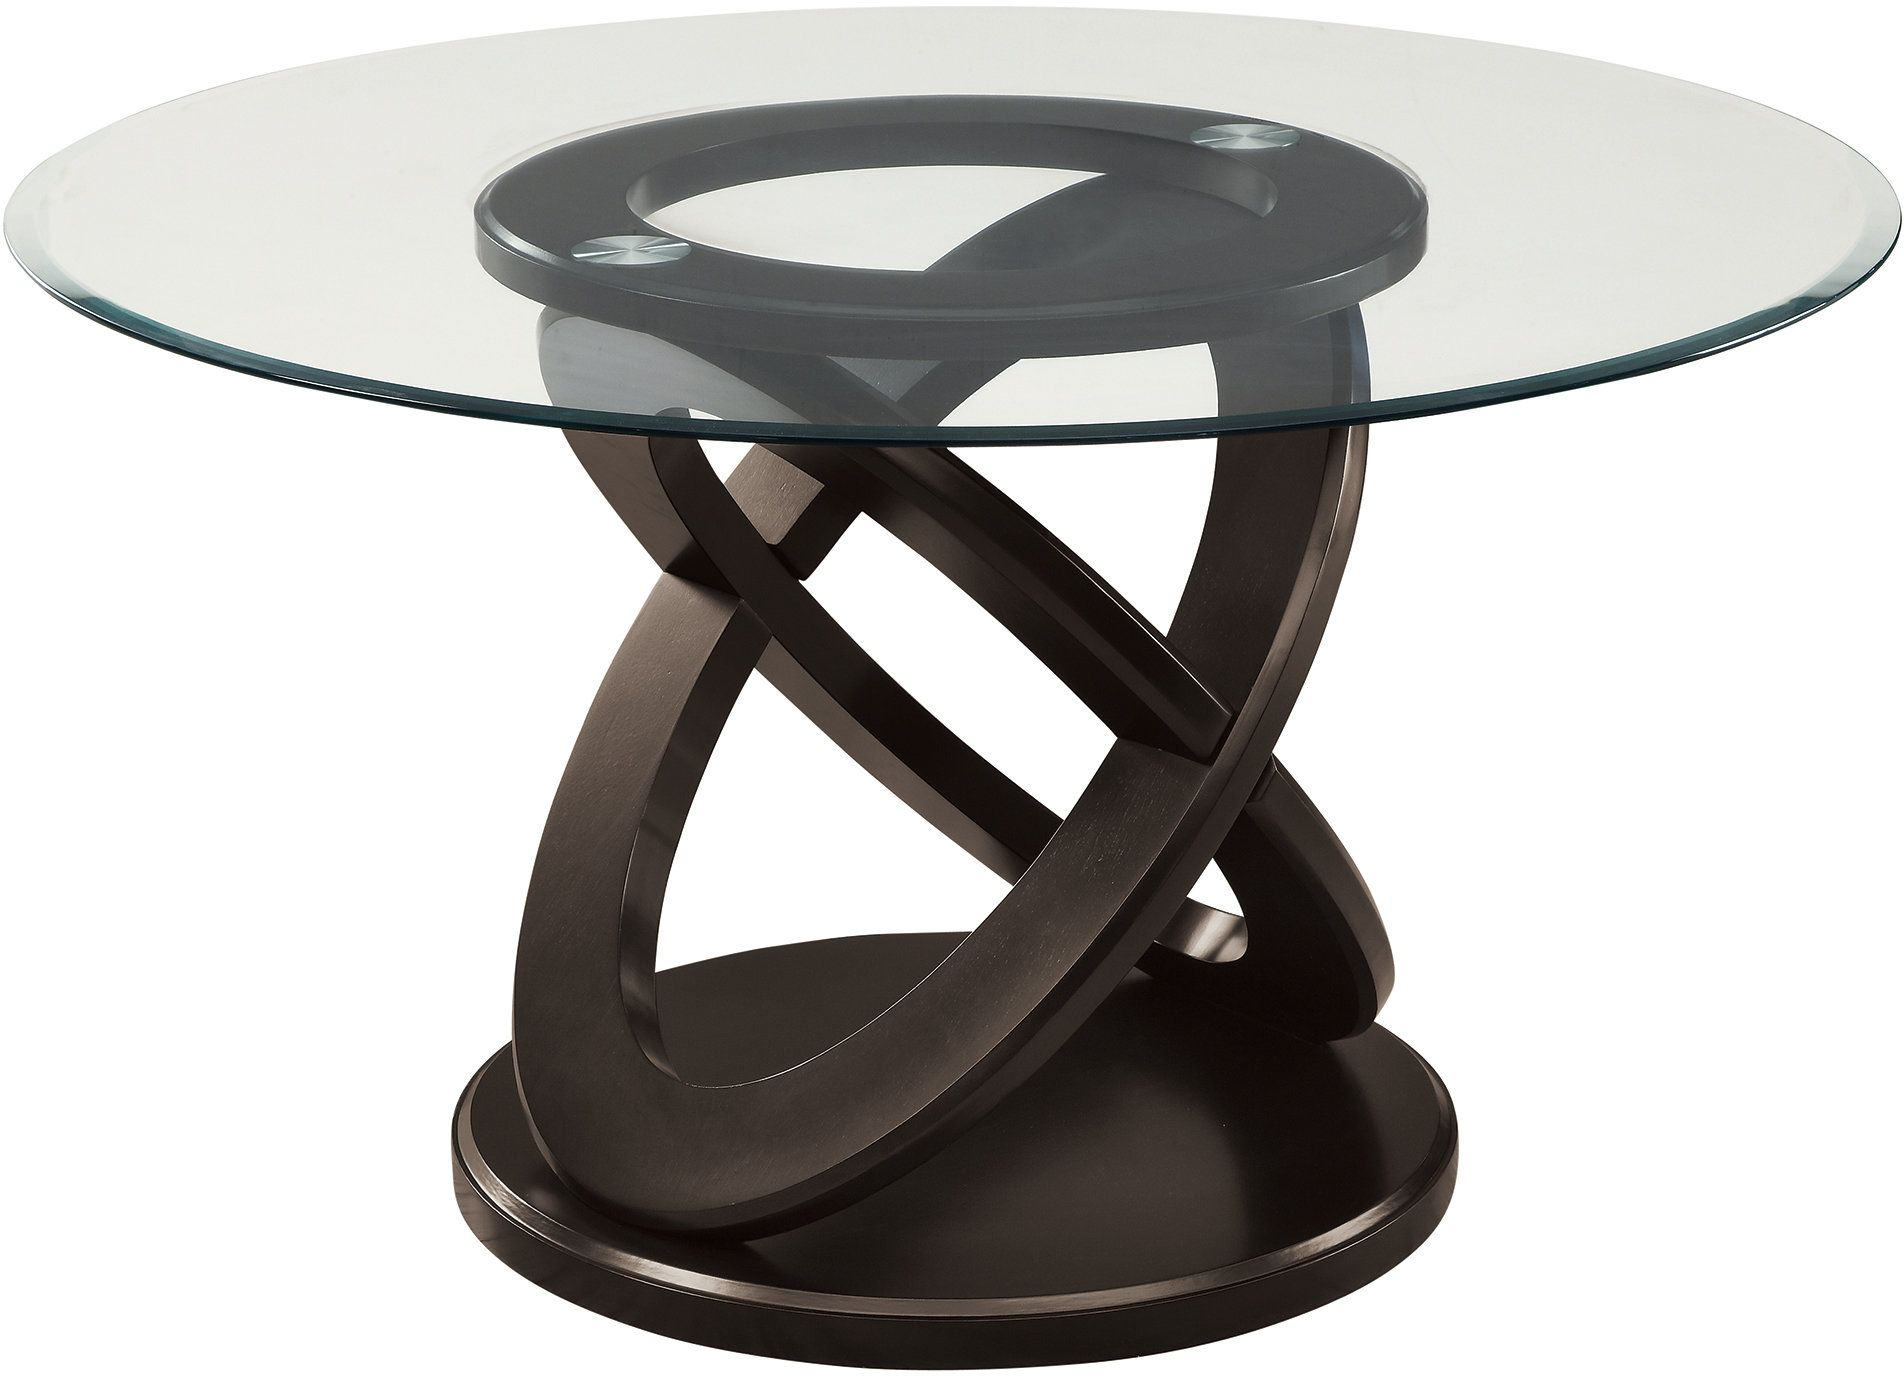 spec designs by monarch specialties guysborough dining table dark espresso i 1749 modern furniture canada